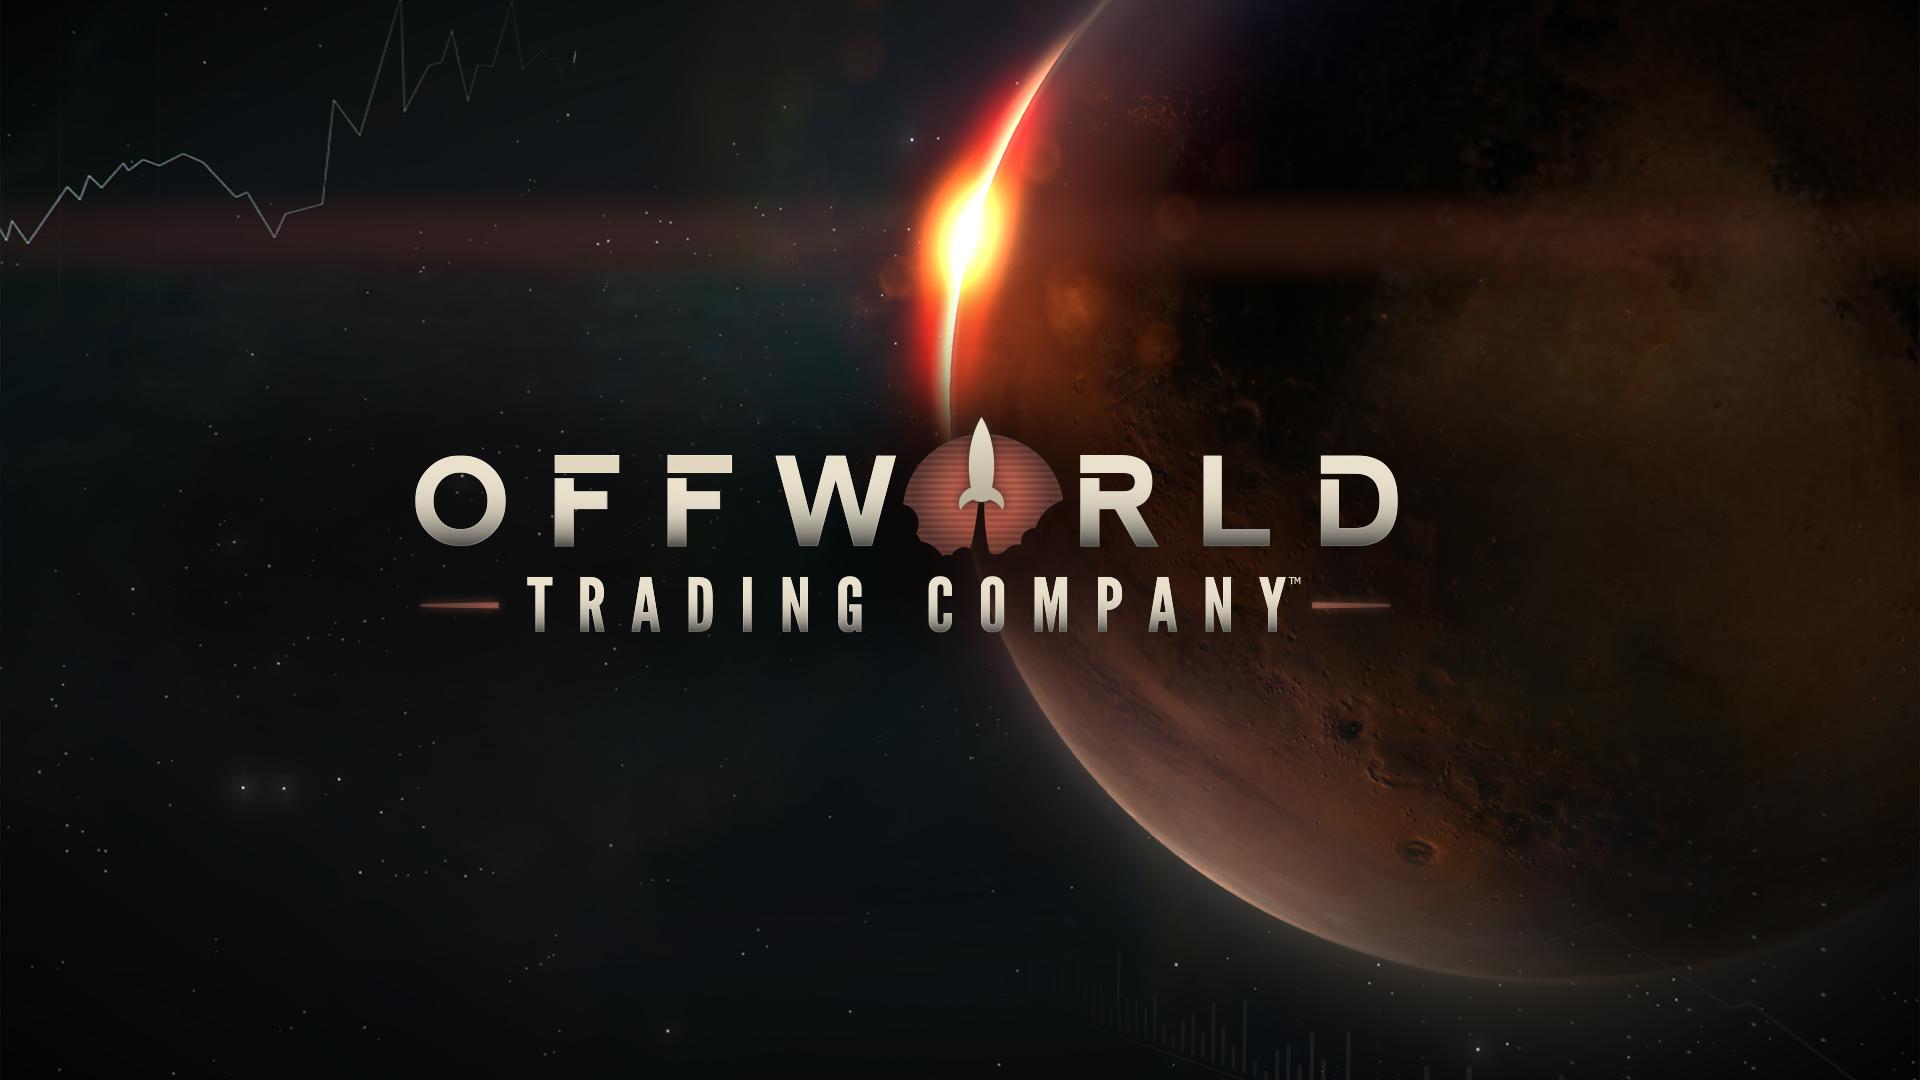 Claim Offworld Trading Company for free!